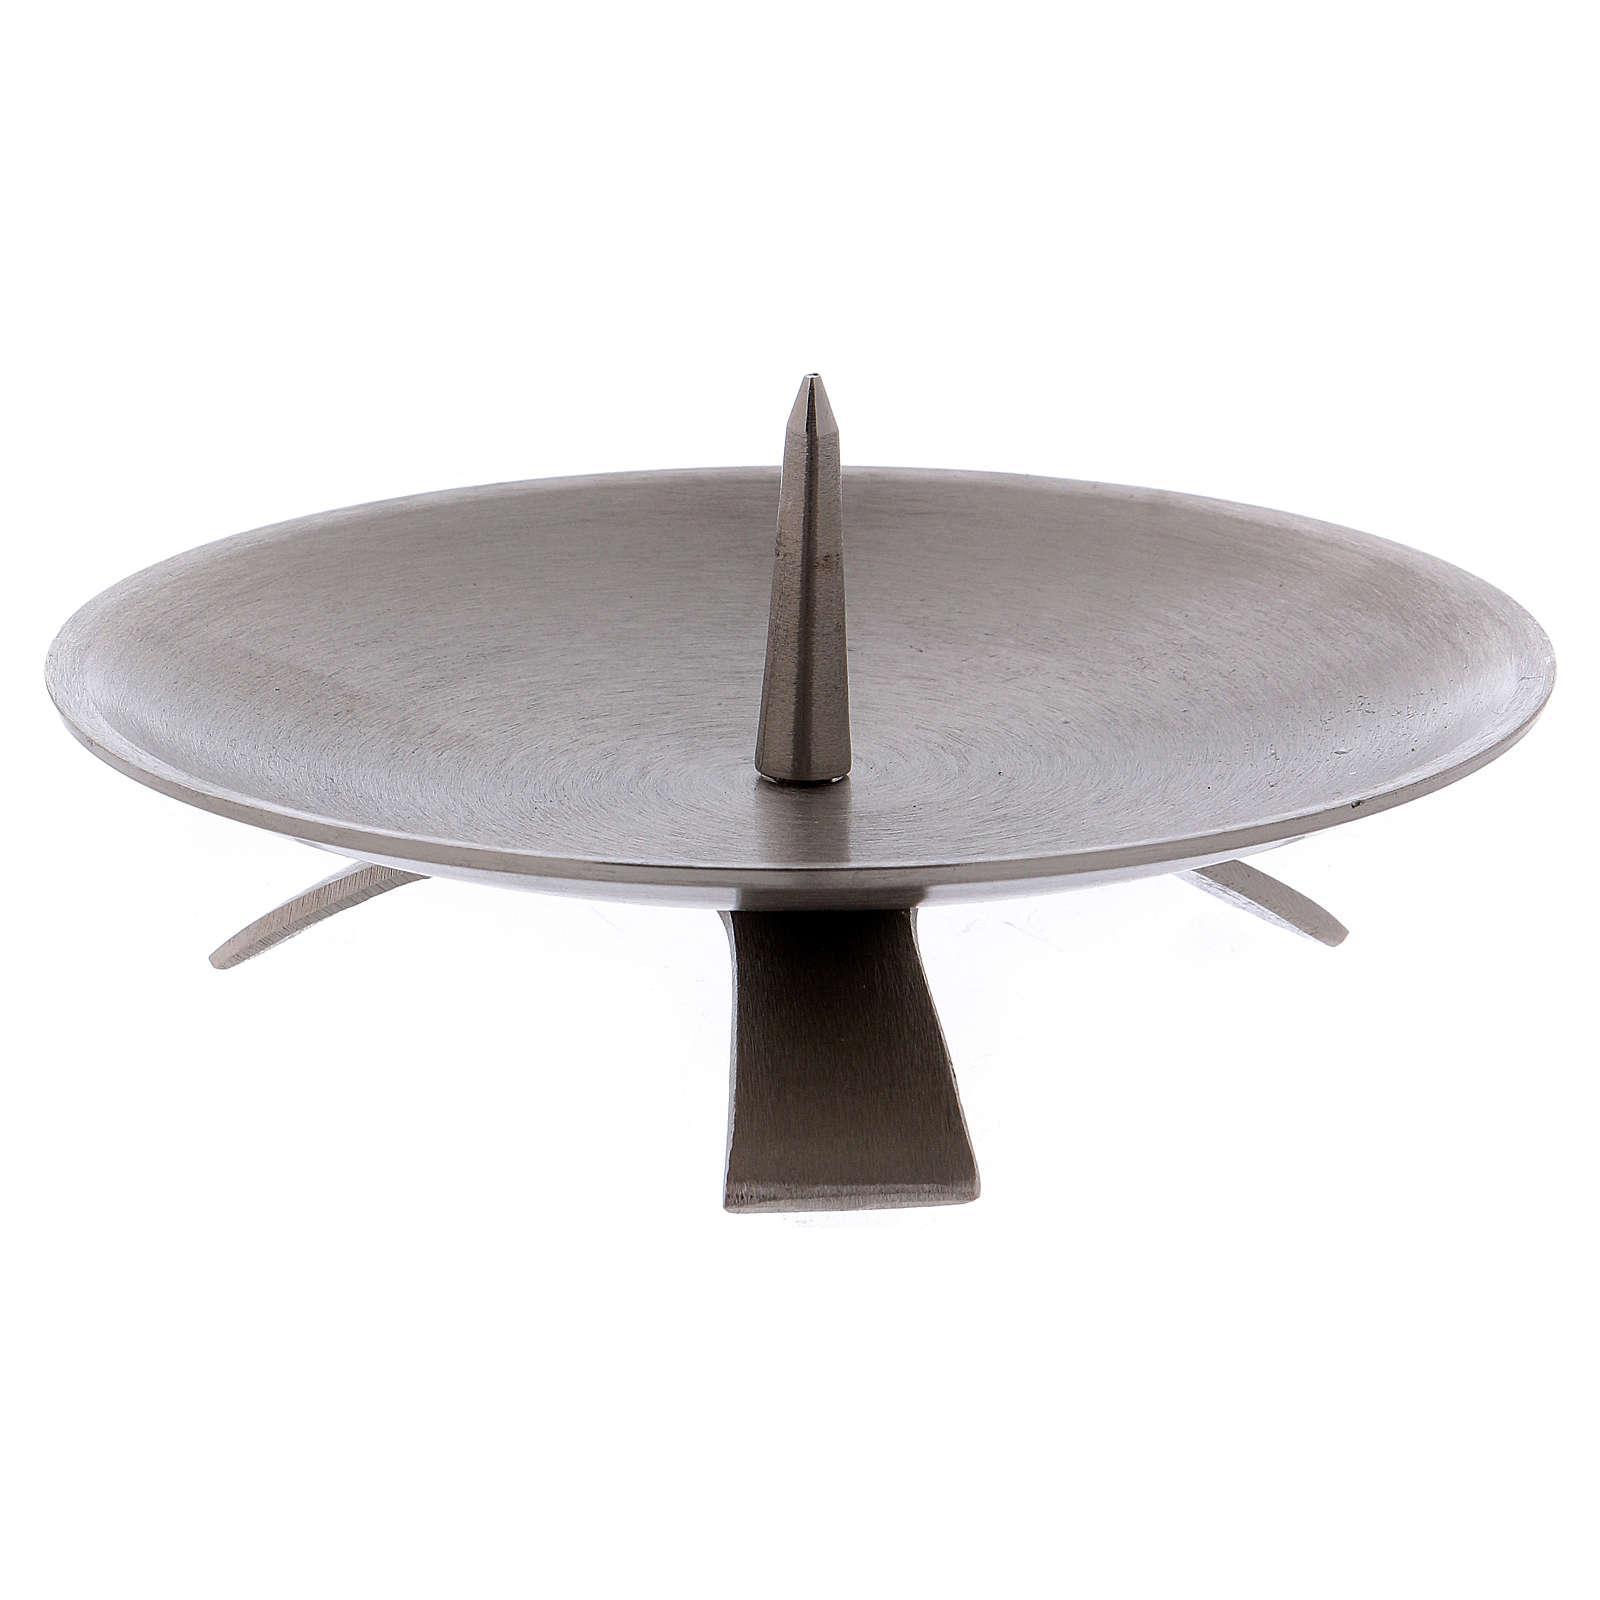 Portacandela treppiedi spuntone centrale 13 cm ottone argento opaco 4